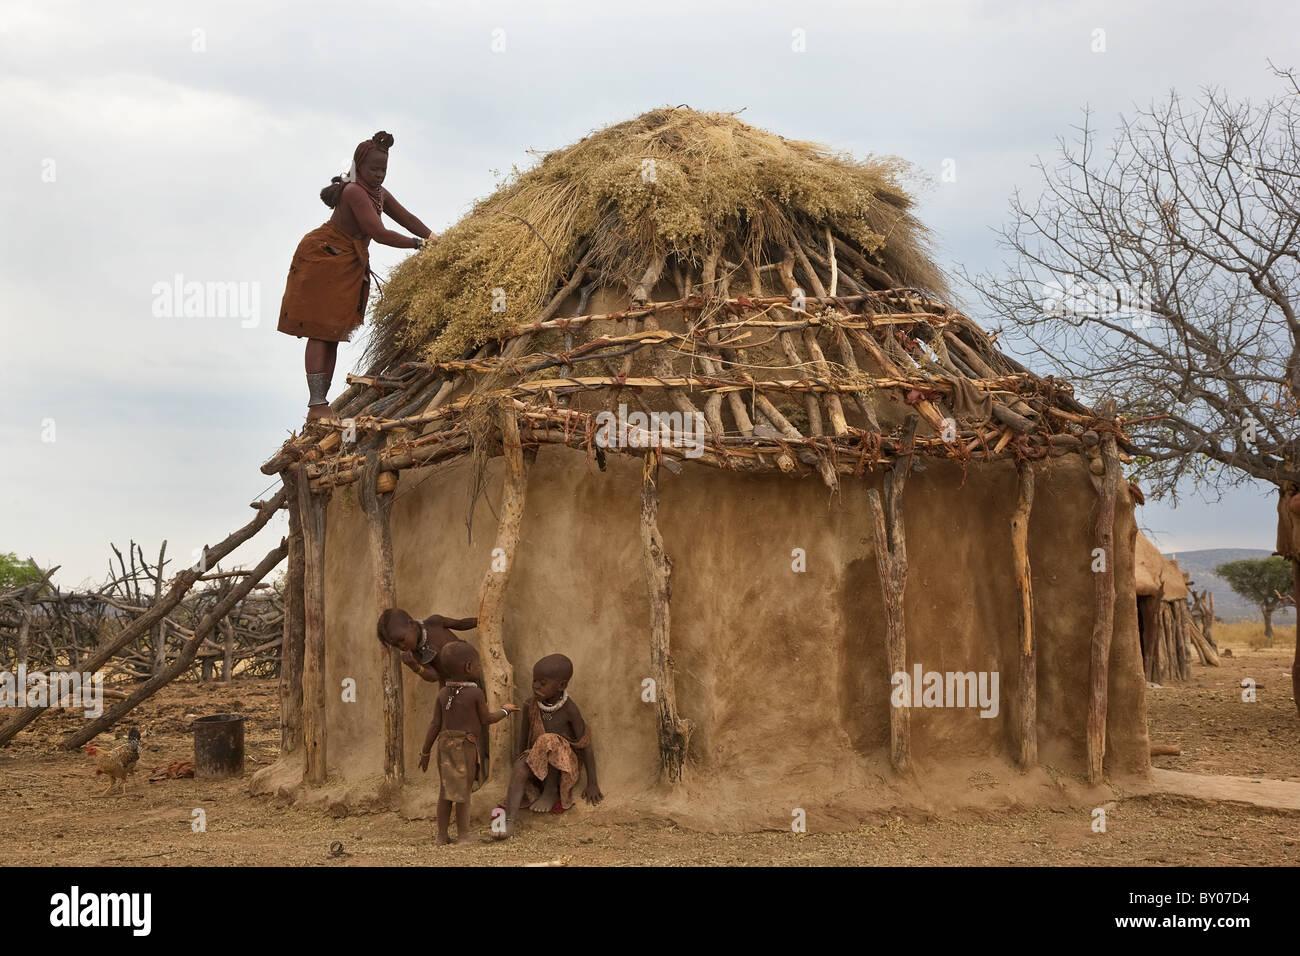 Thatching Himba tribe hut, Kaokoland, Namibia - Stock Image